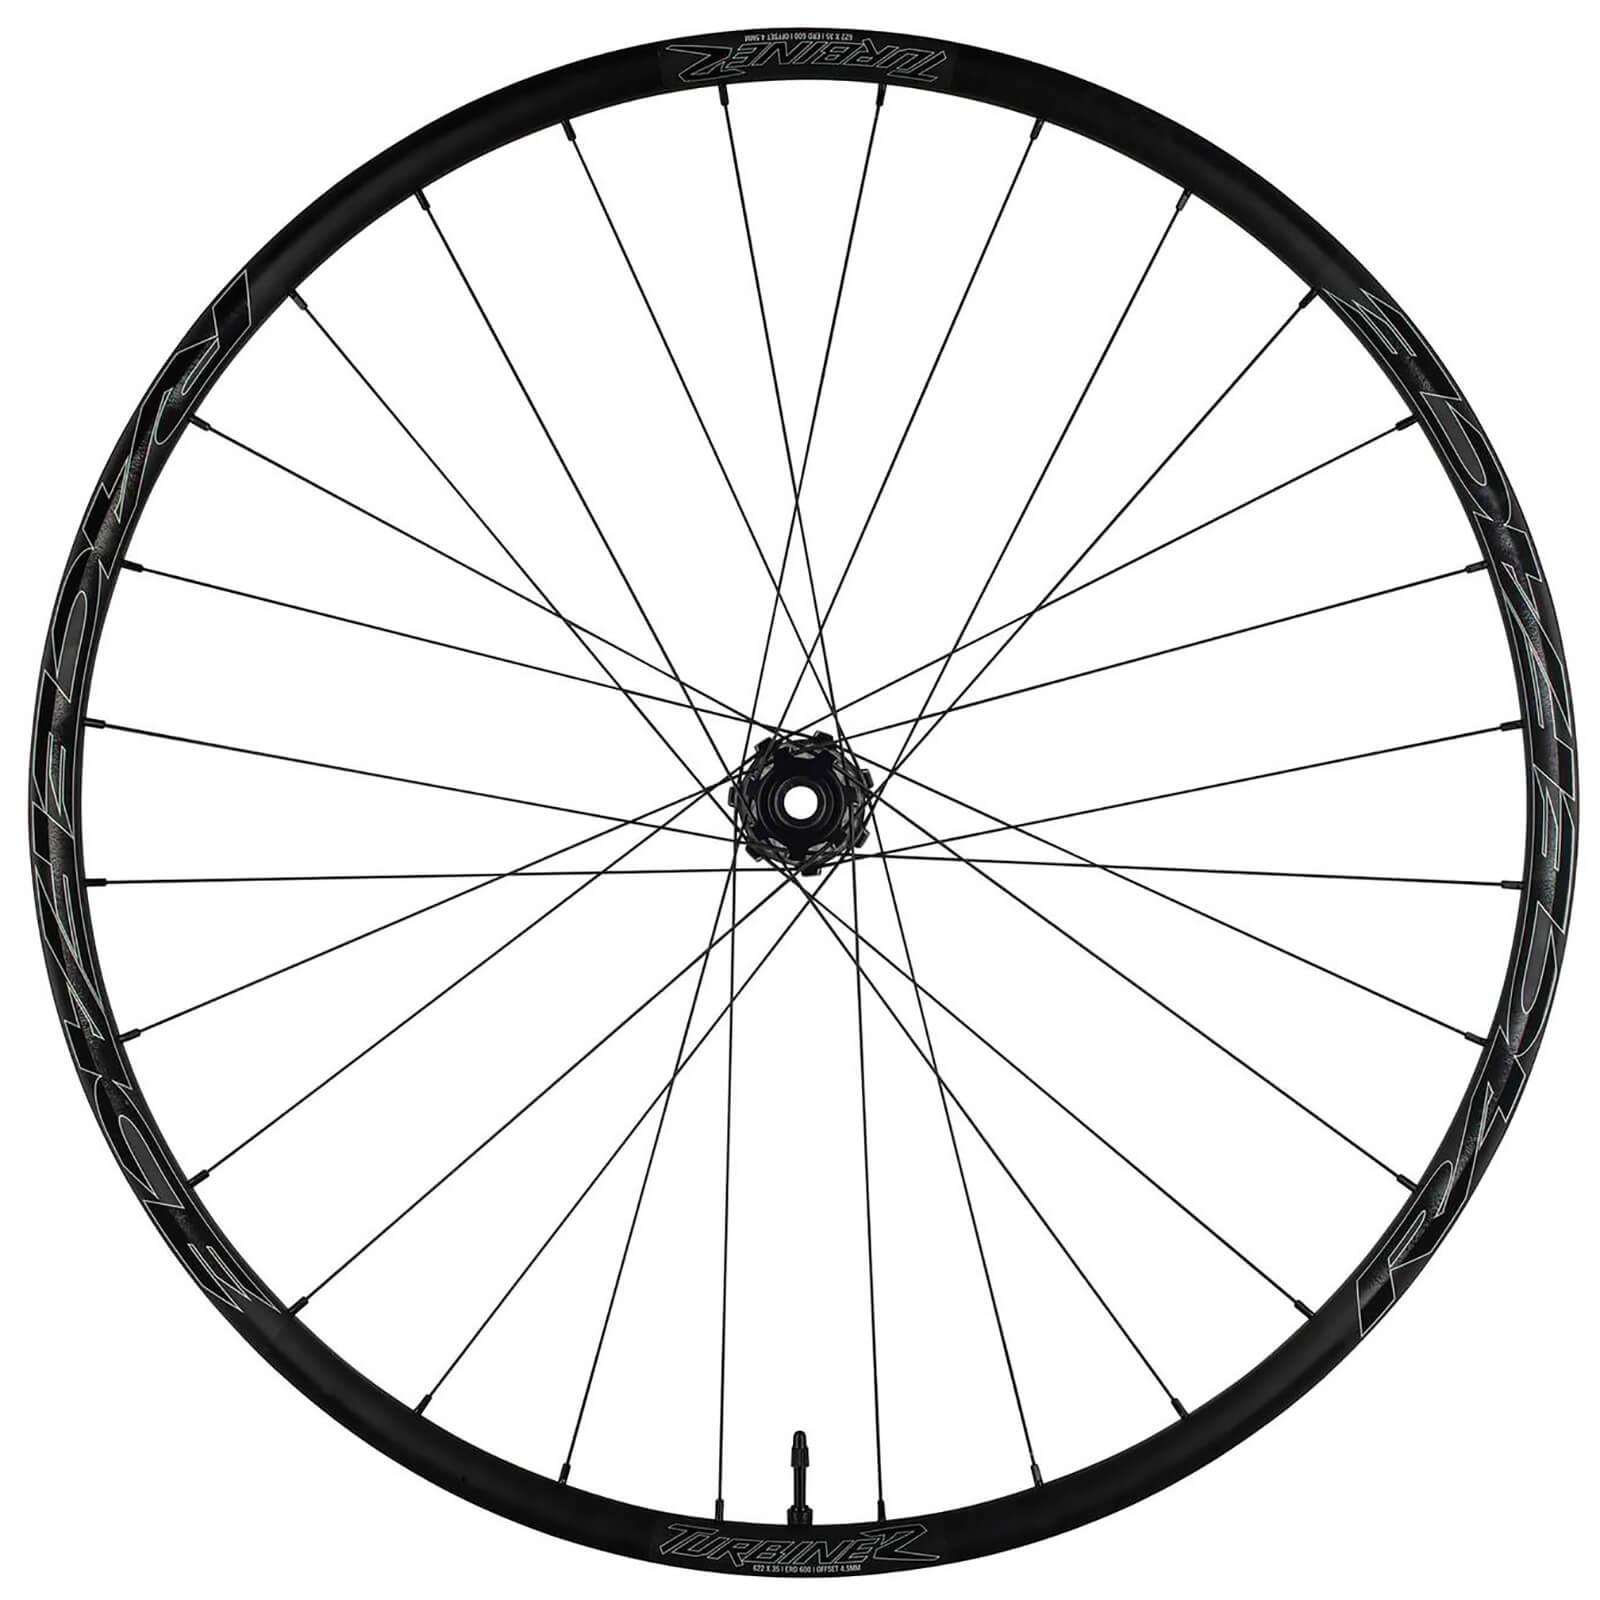 Race Face Turbine R 30mm MTB Alloy Front Wheel - 29 Inch/15 x 110mm